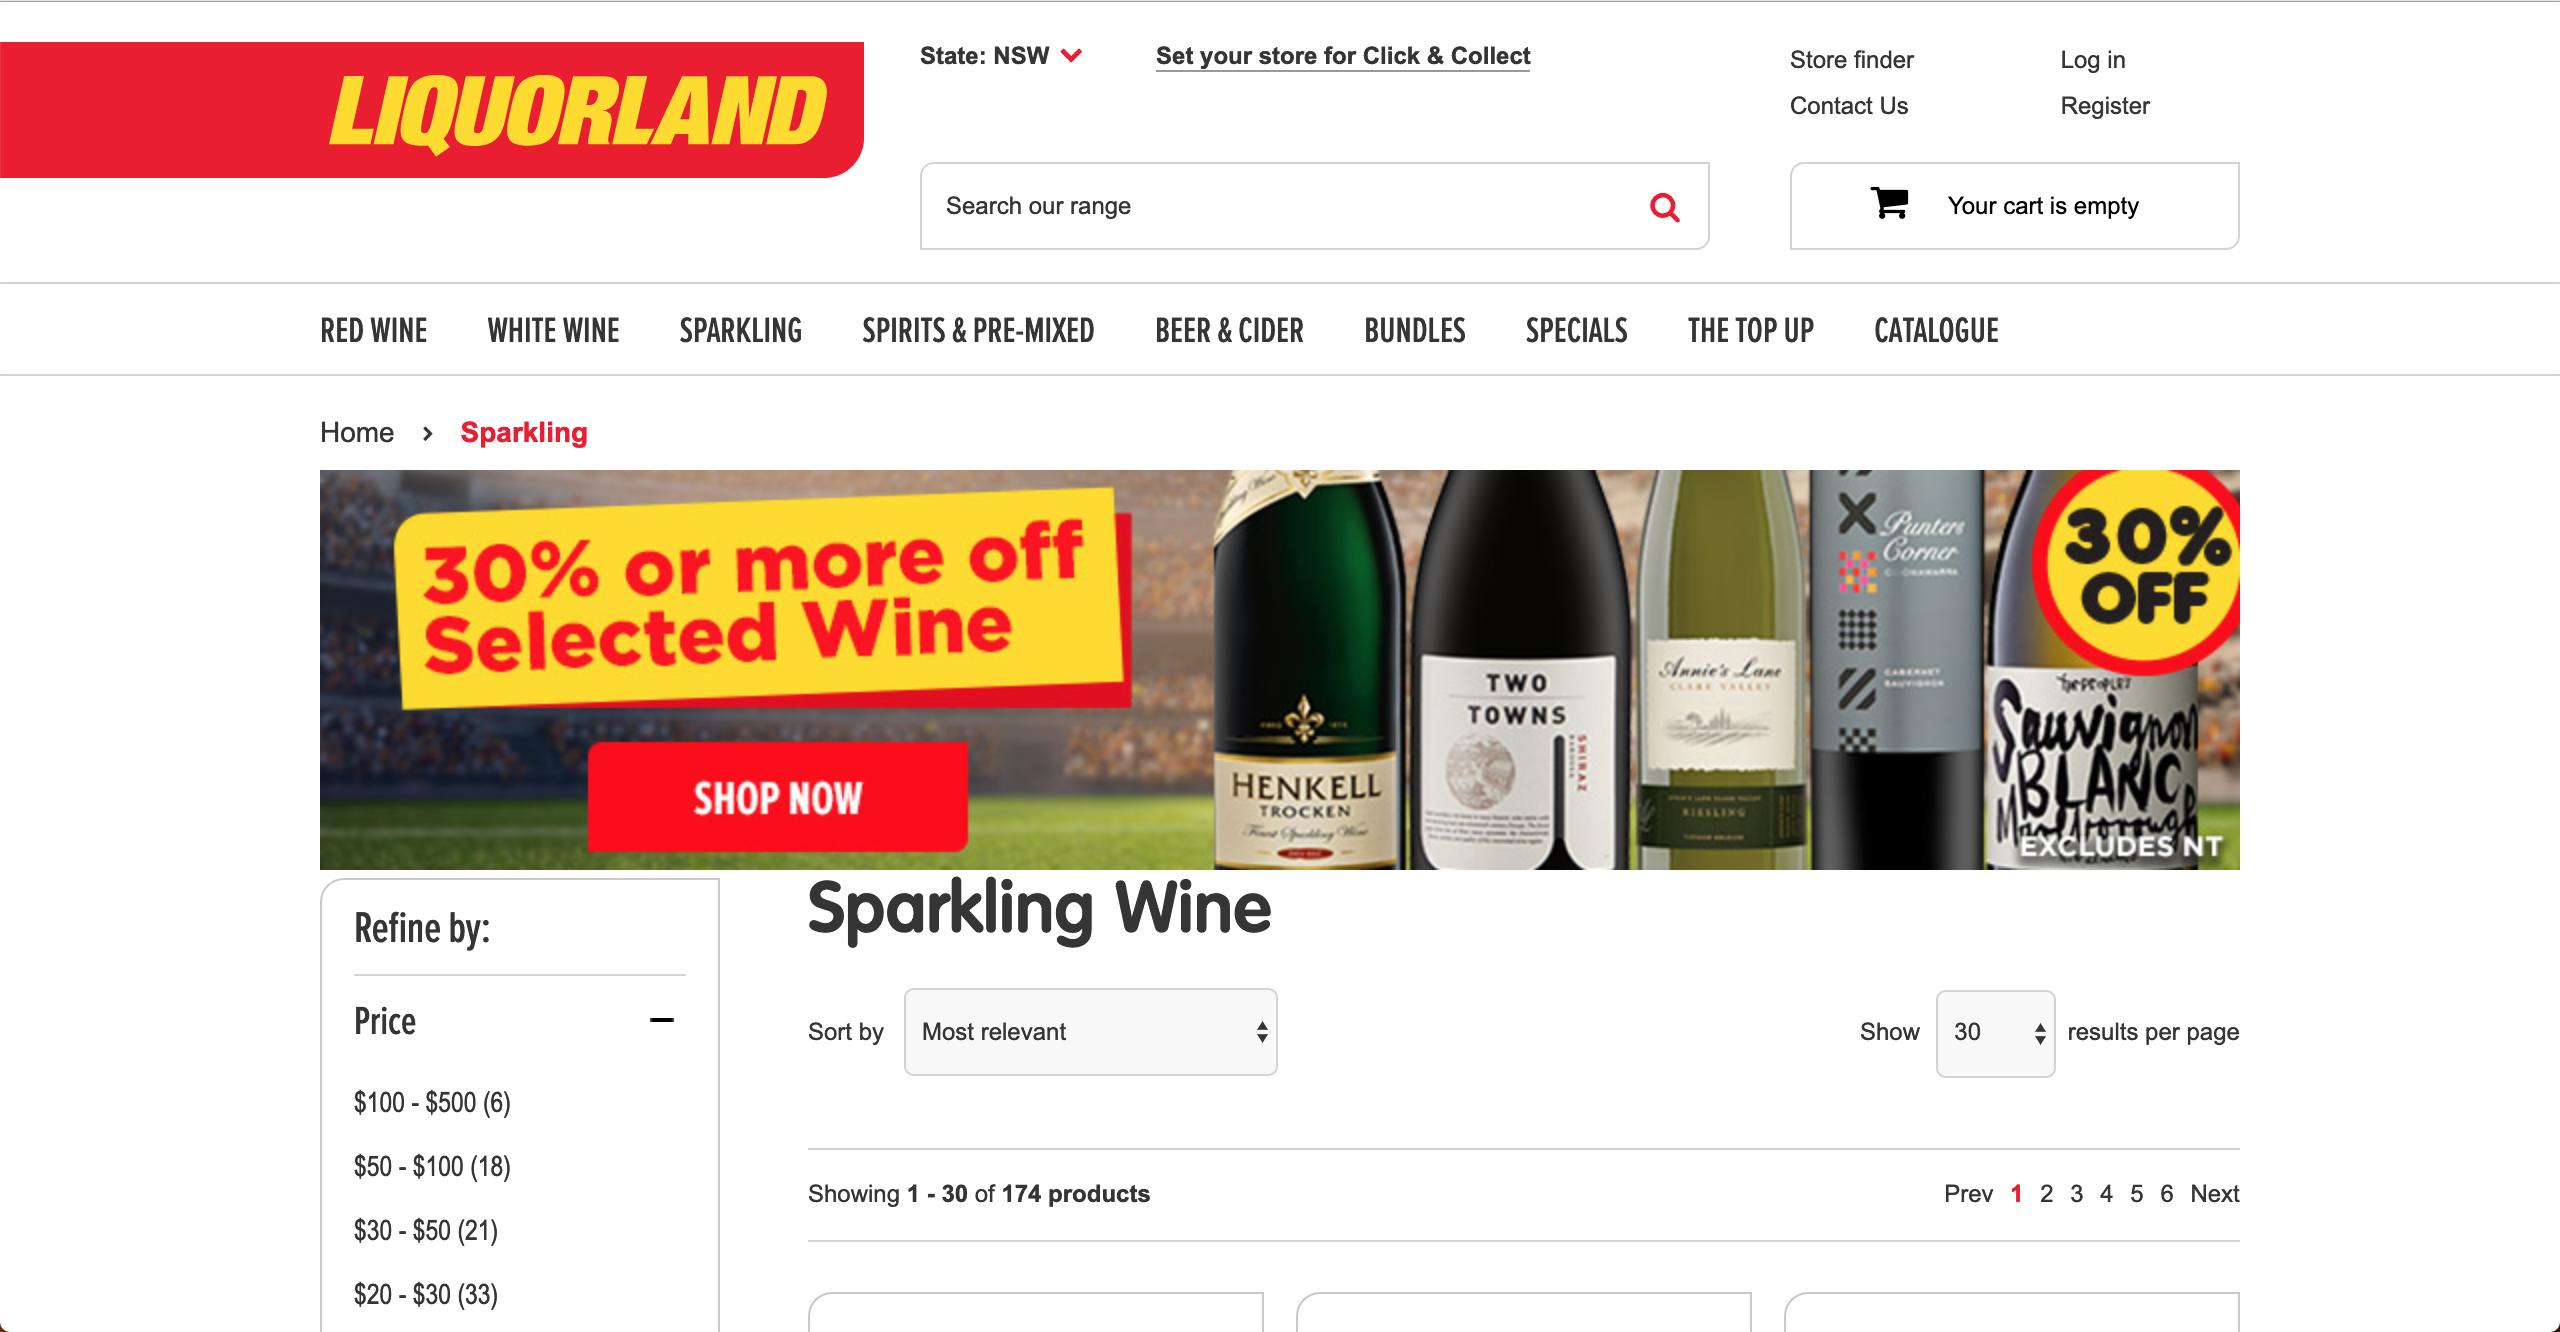 Liquorland Sparkling Wine